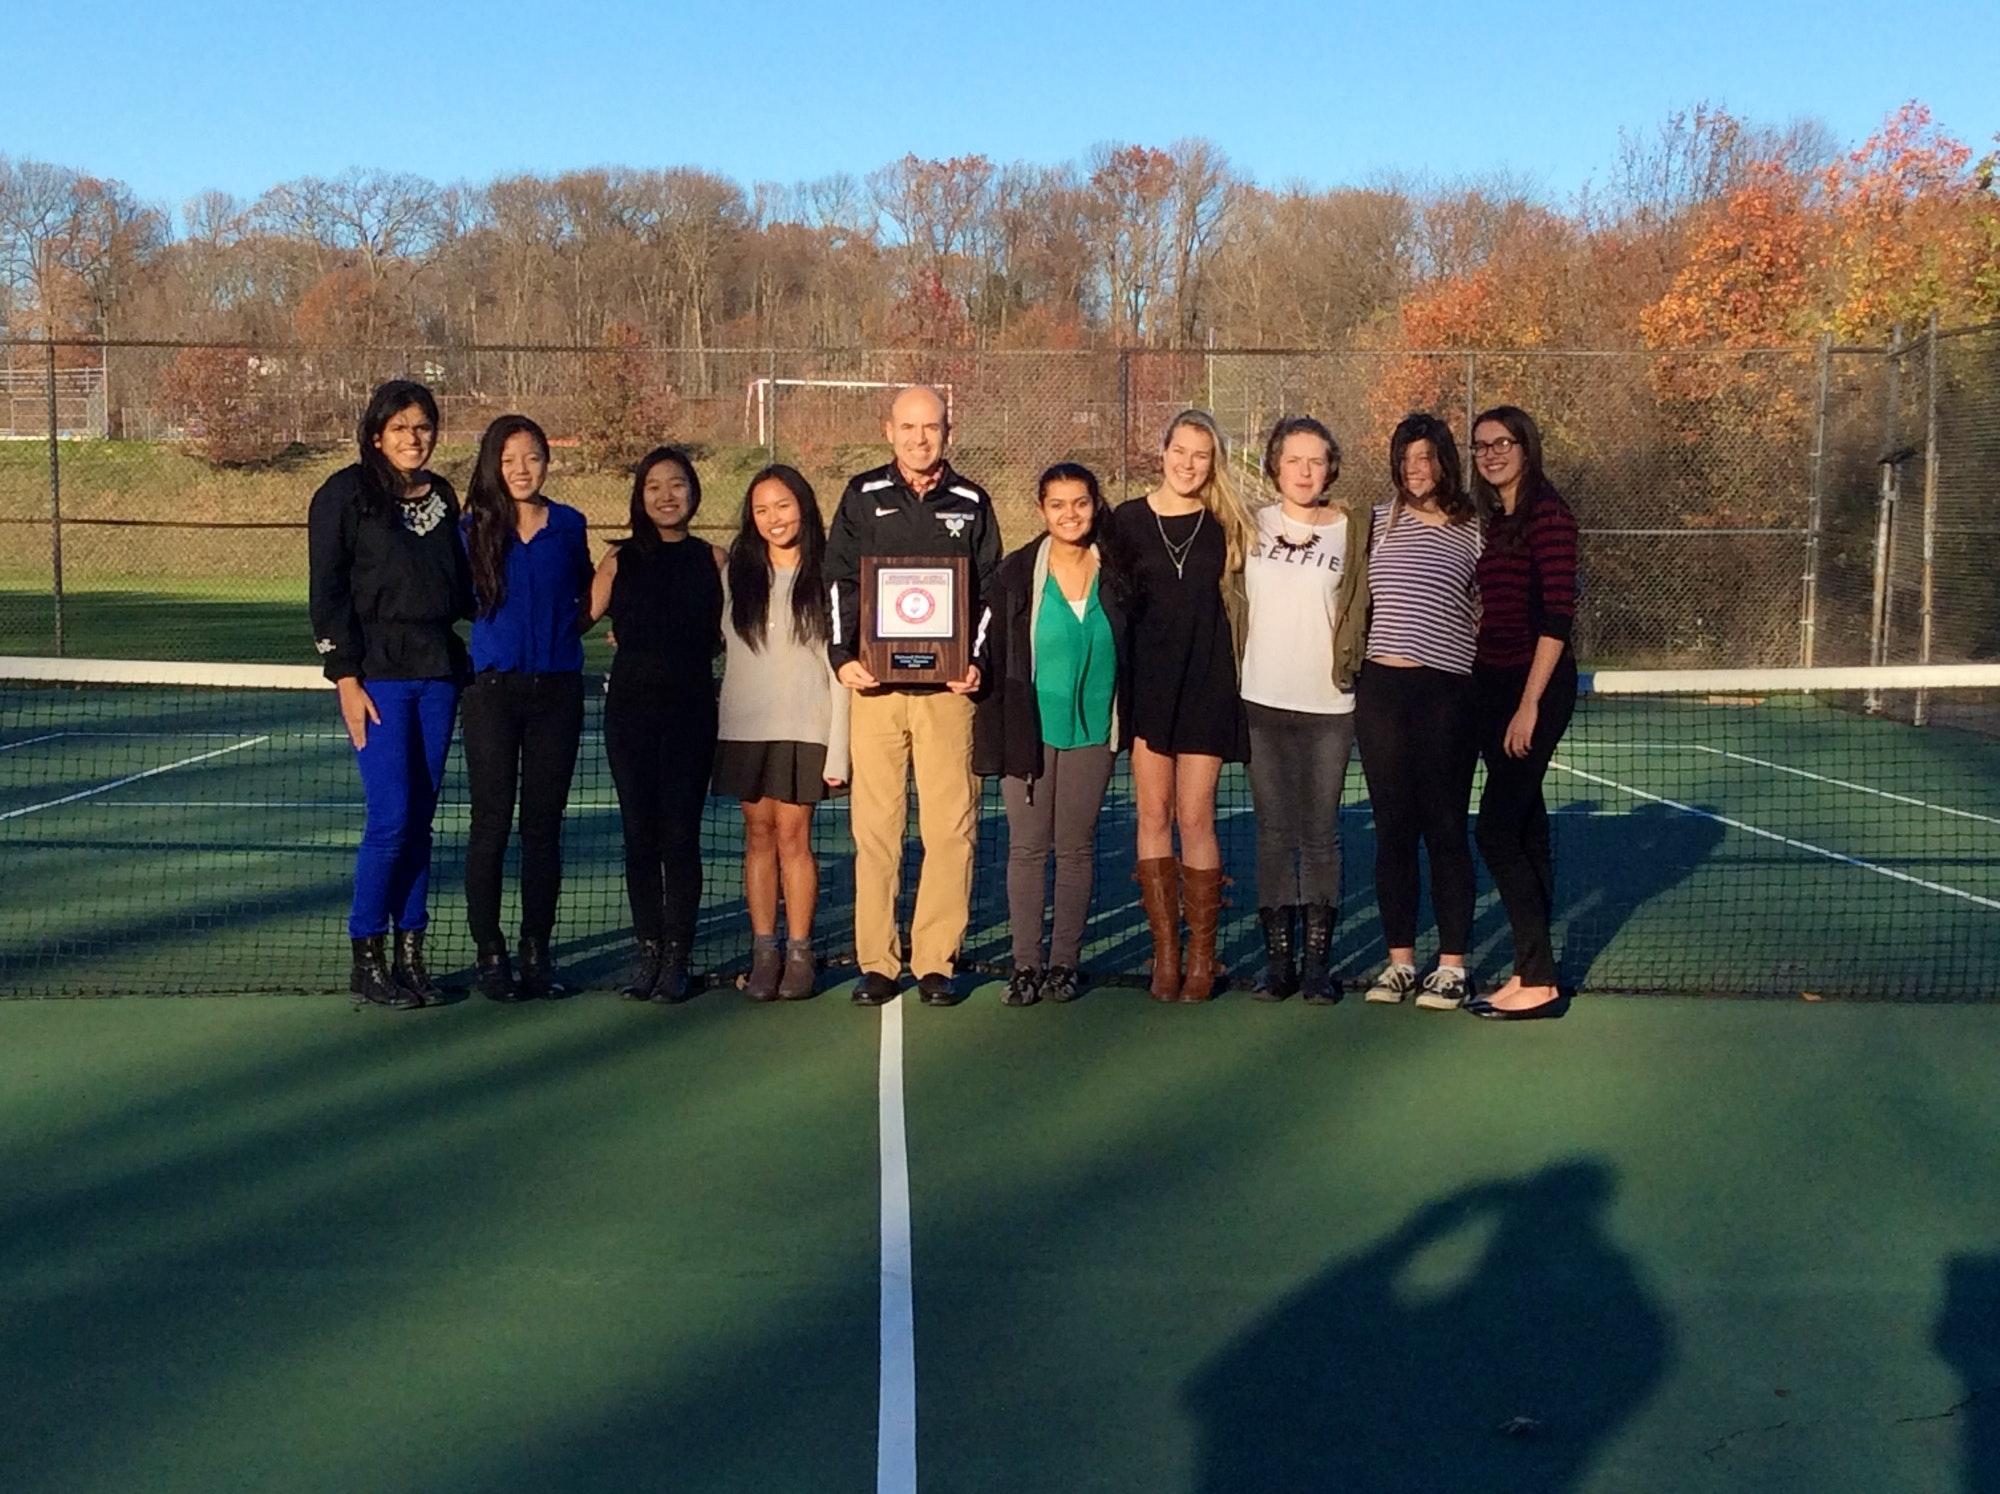 David B. teaches tennis lessons in Cranford, NJ